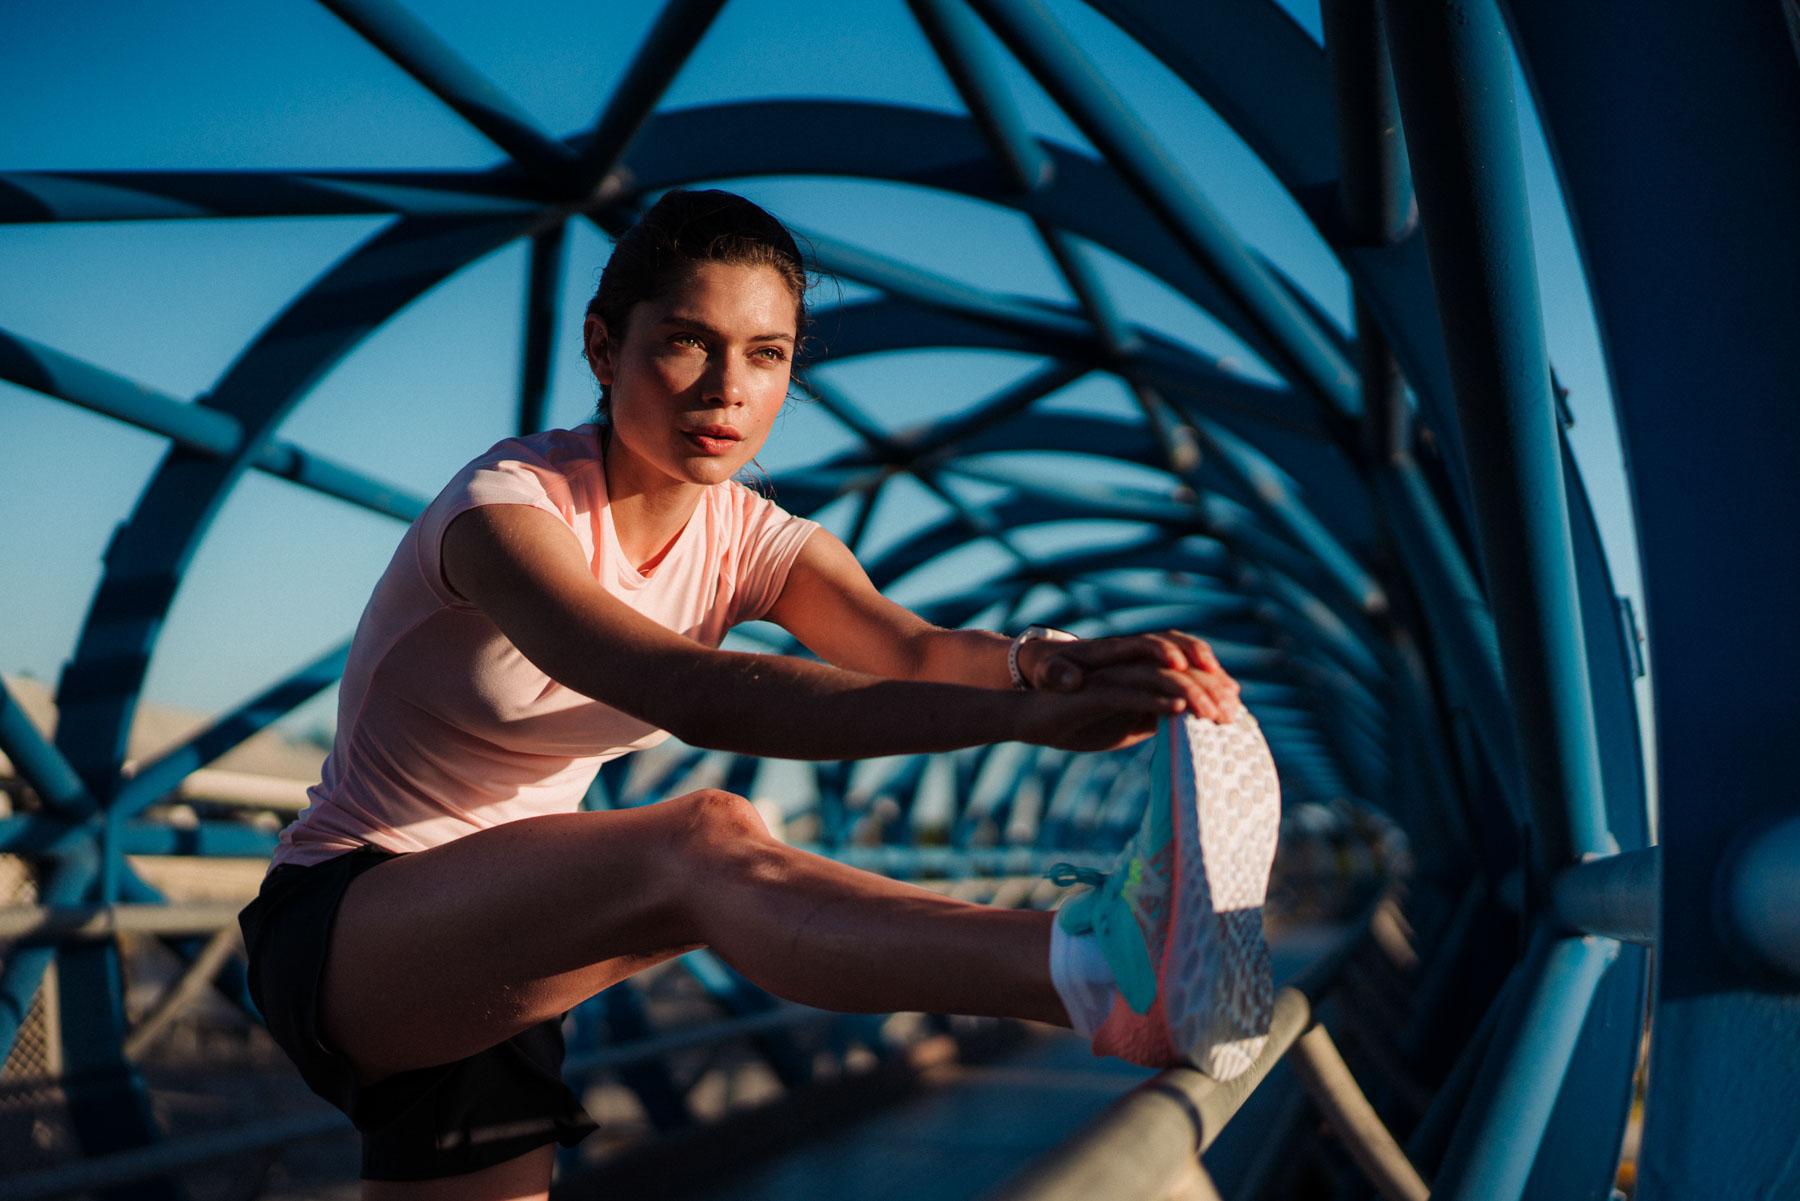 Sport XX – Sport & Lifestyle – Christel Thoresen, Hair and Make-Up Artist